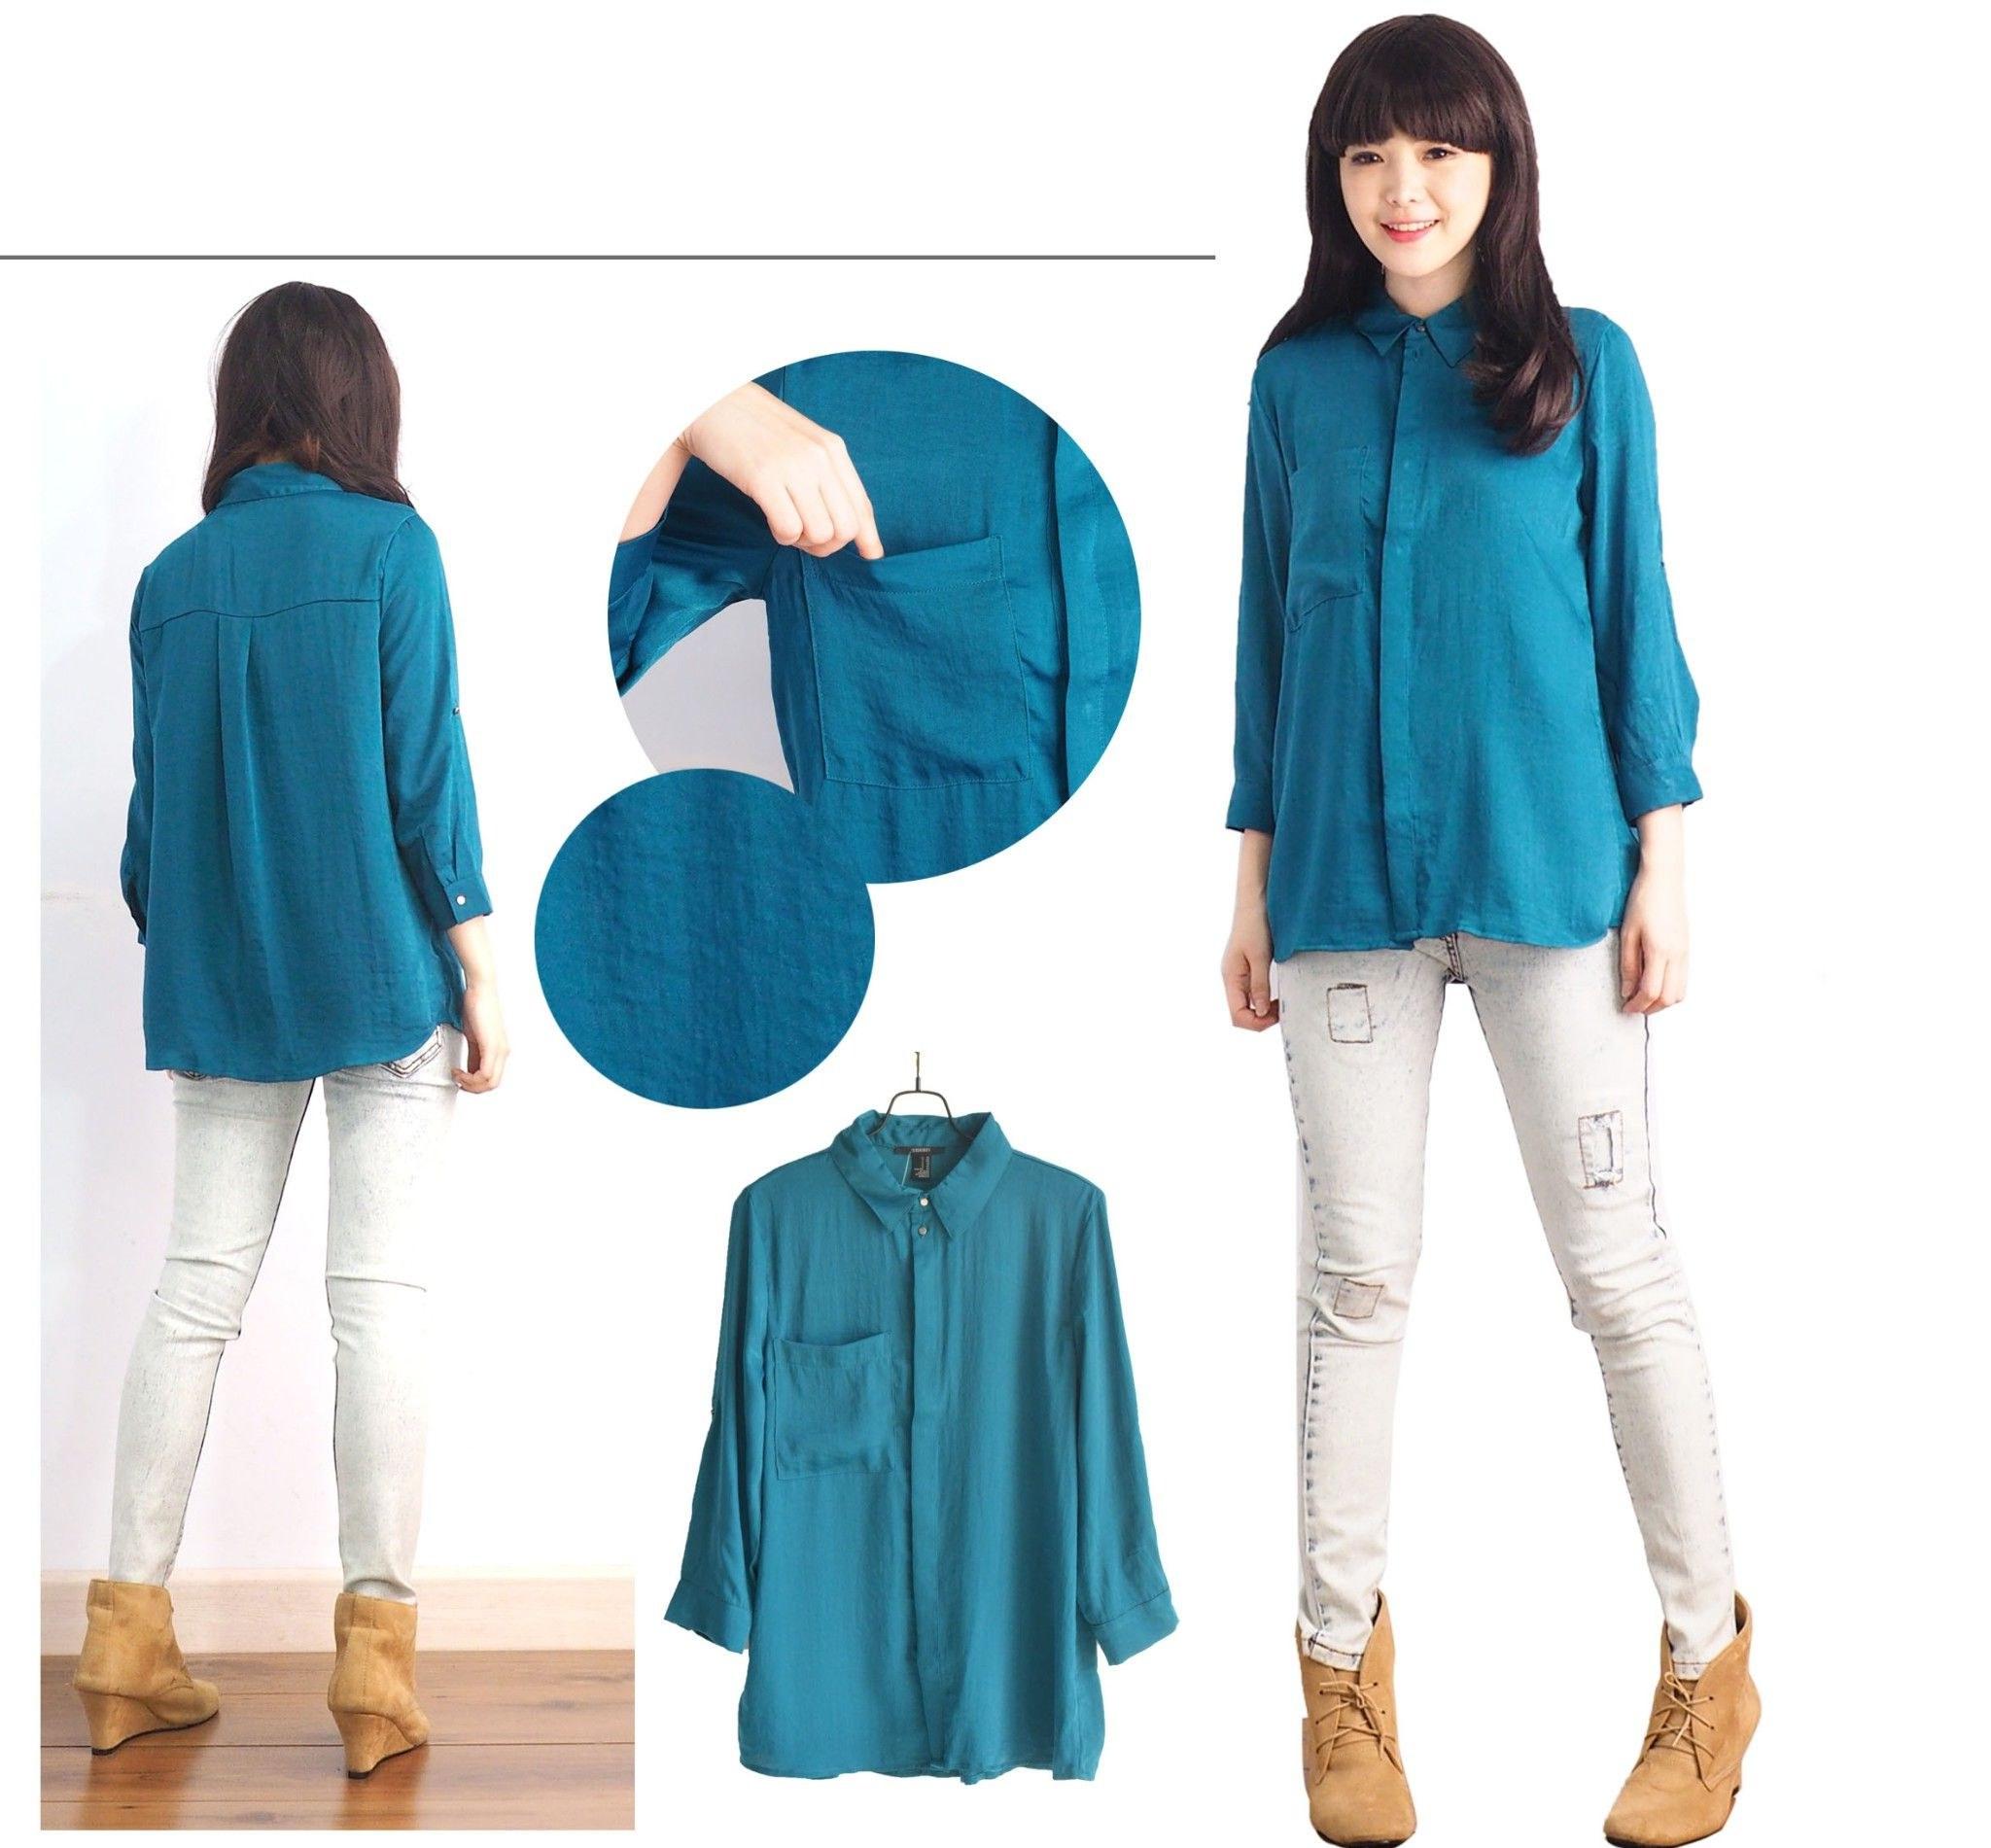 Design Baju Lebaran Wanita 3ldq Blouse Muslim Model Pakaian Wanita Terbaru Pakaian Bayi